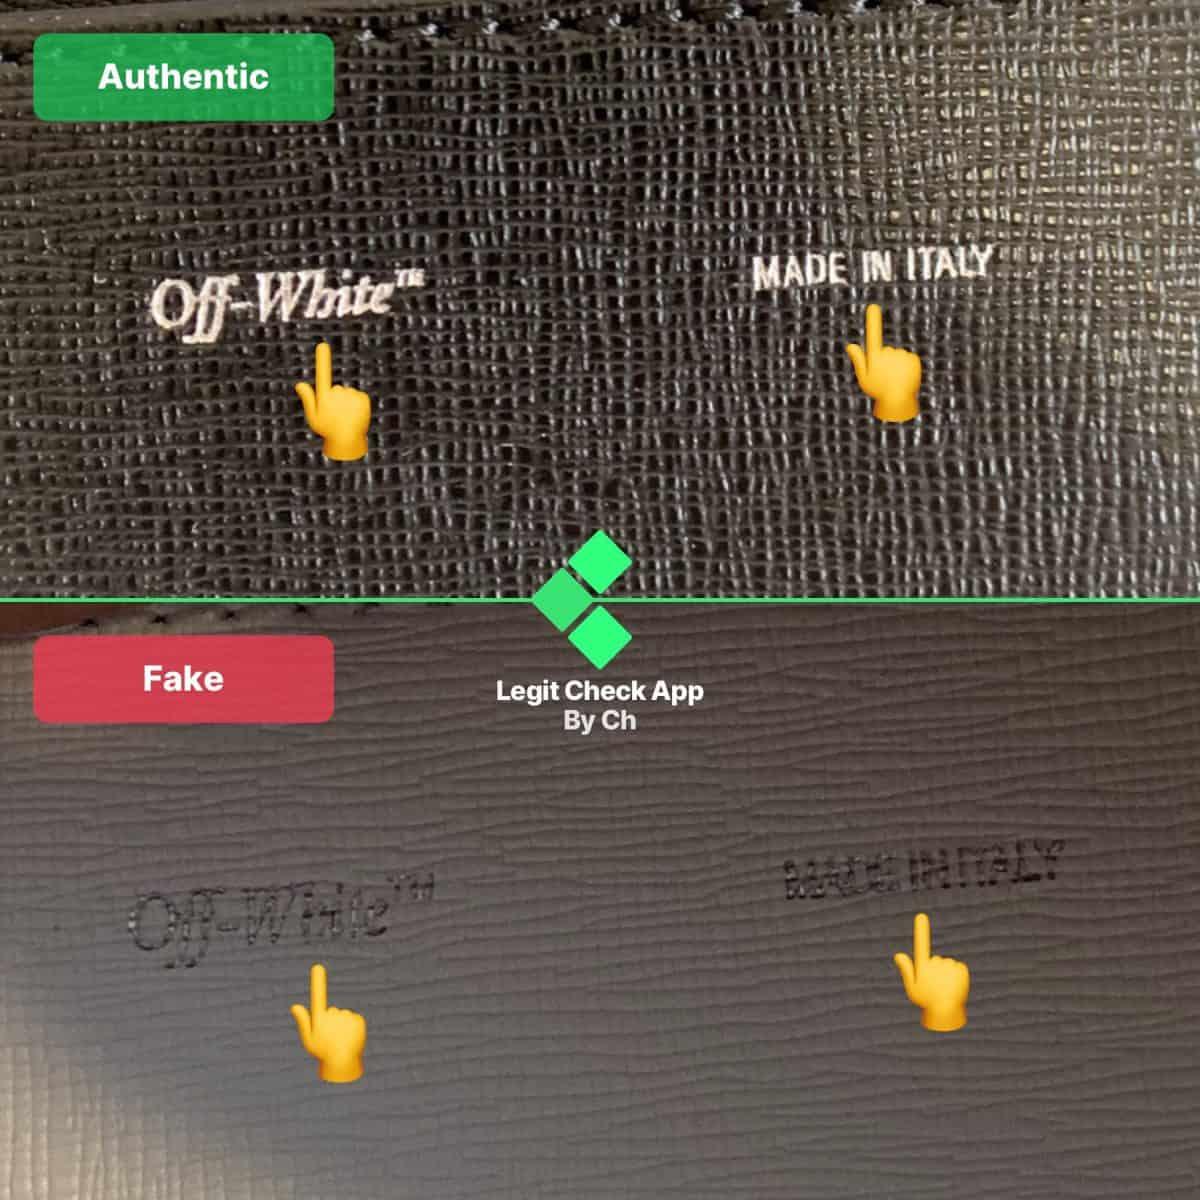 off-white binder clip fake vs real bag guide